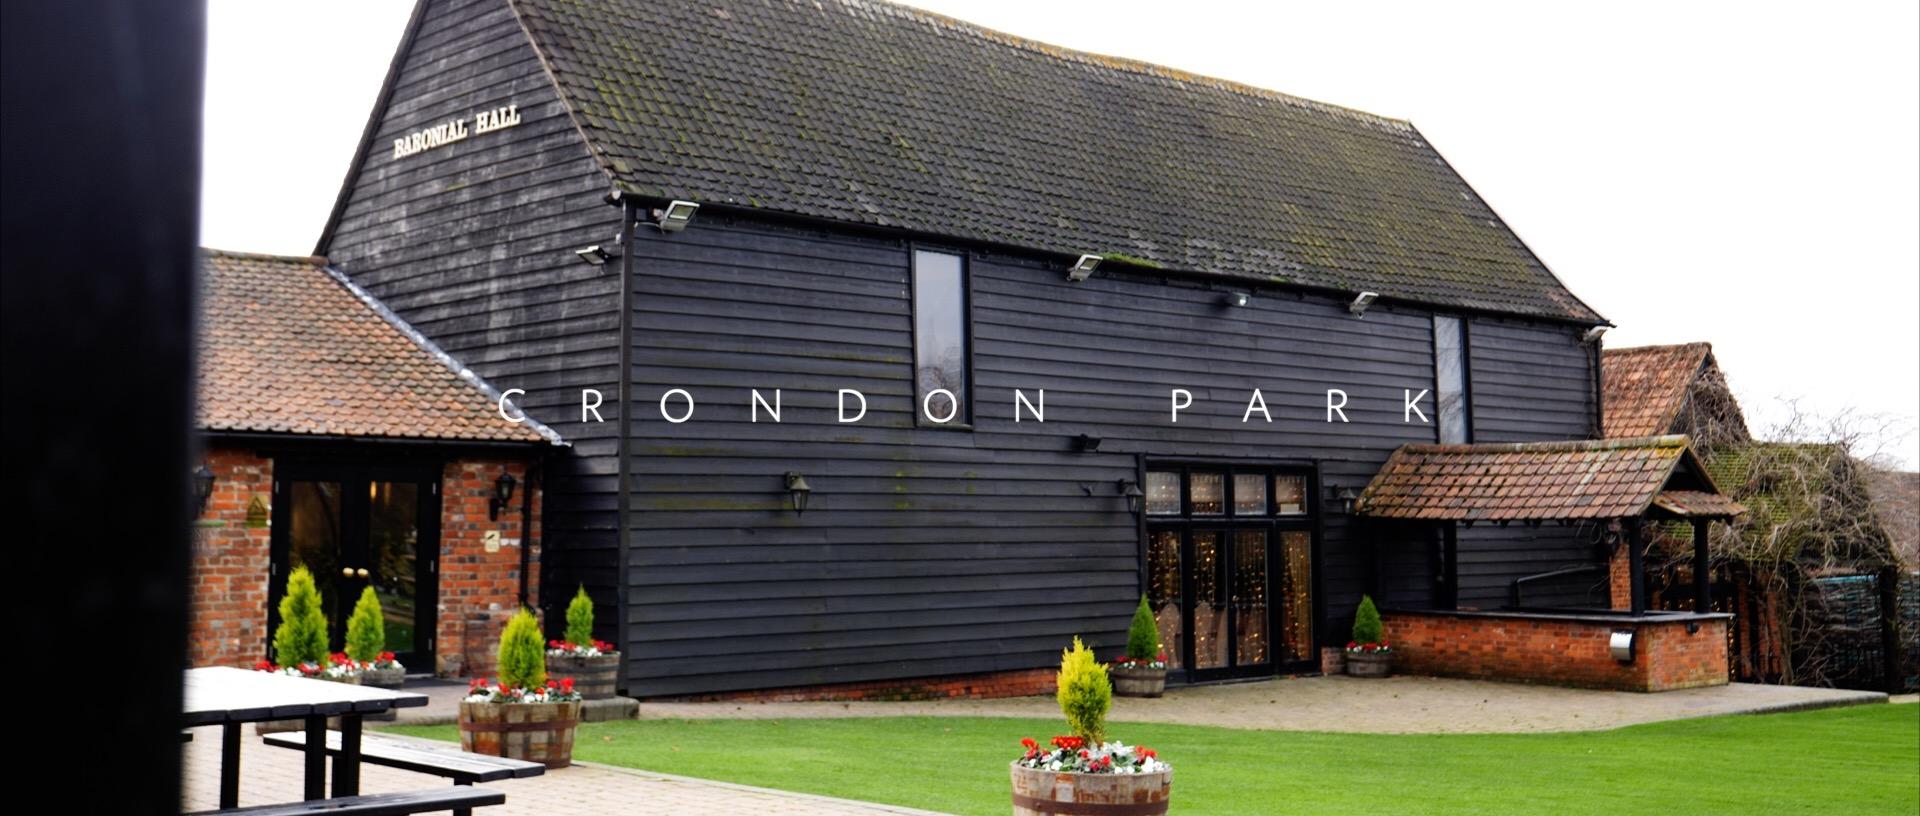 Crondon Park Essex Wedding Video.jpg